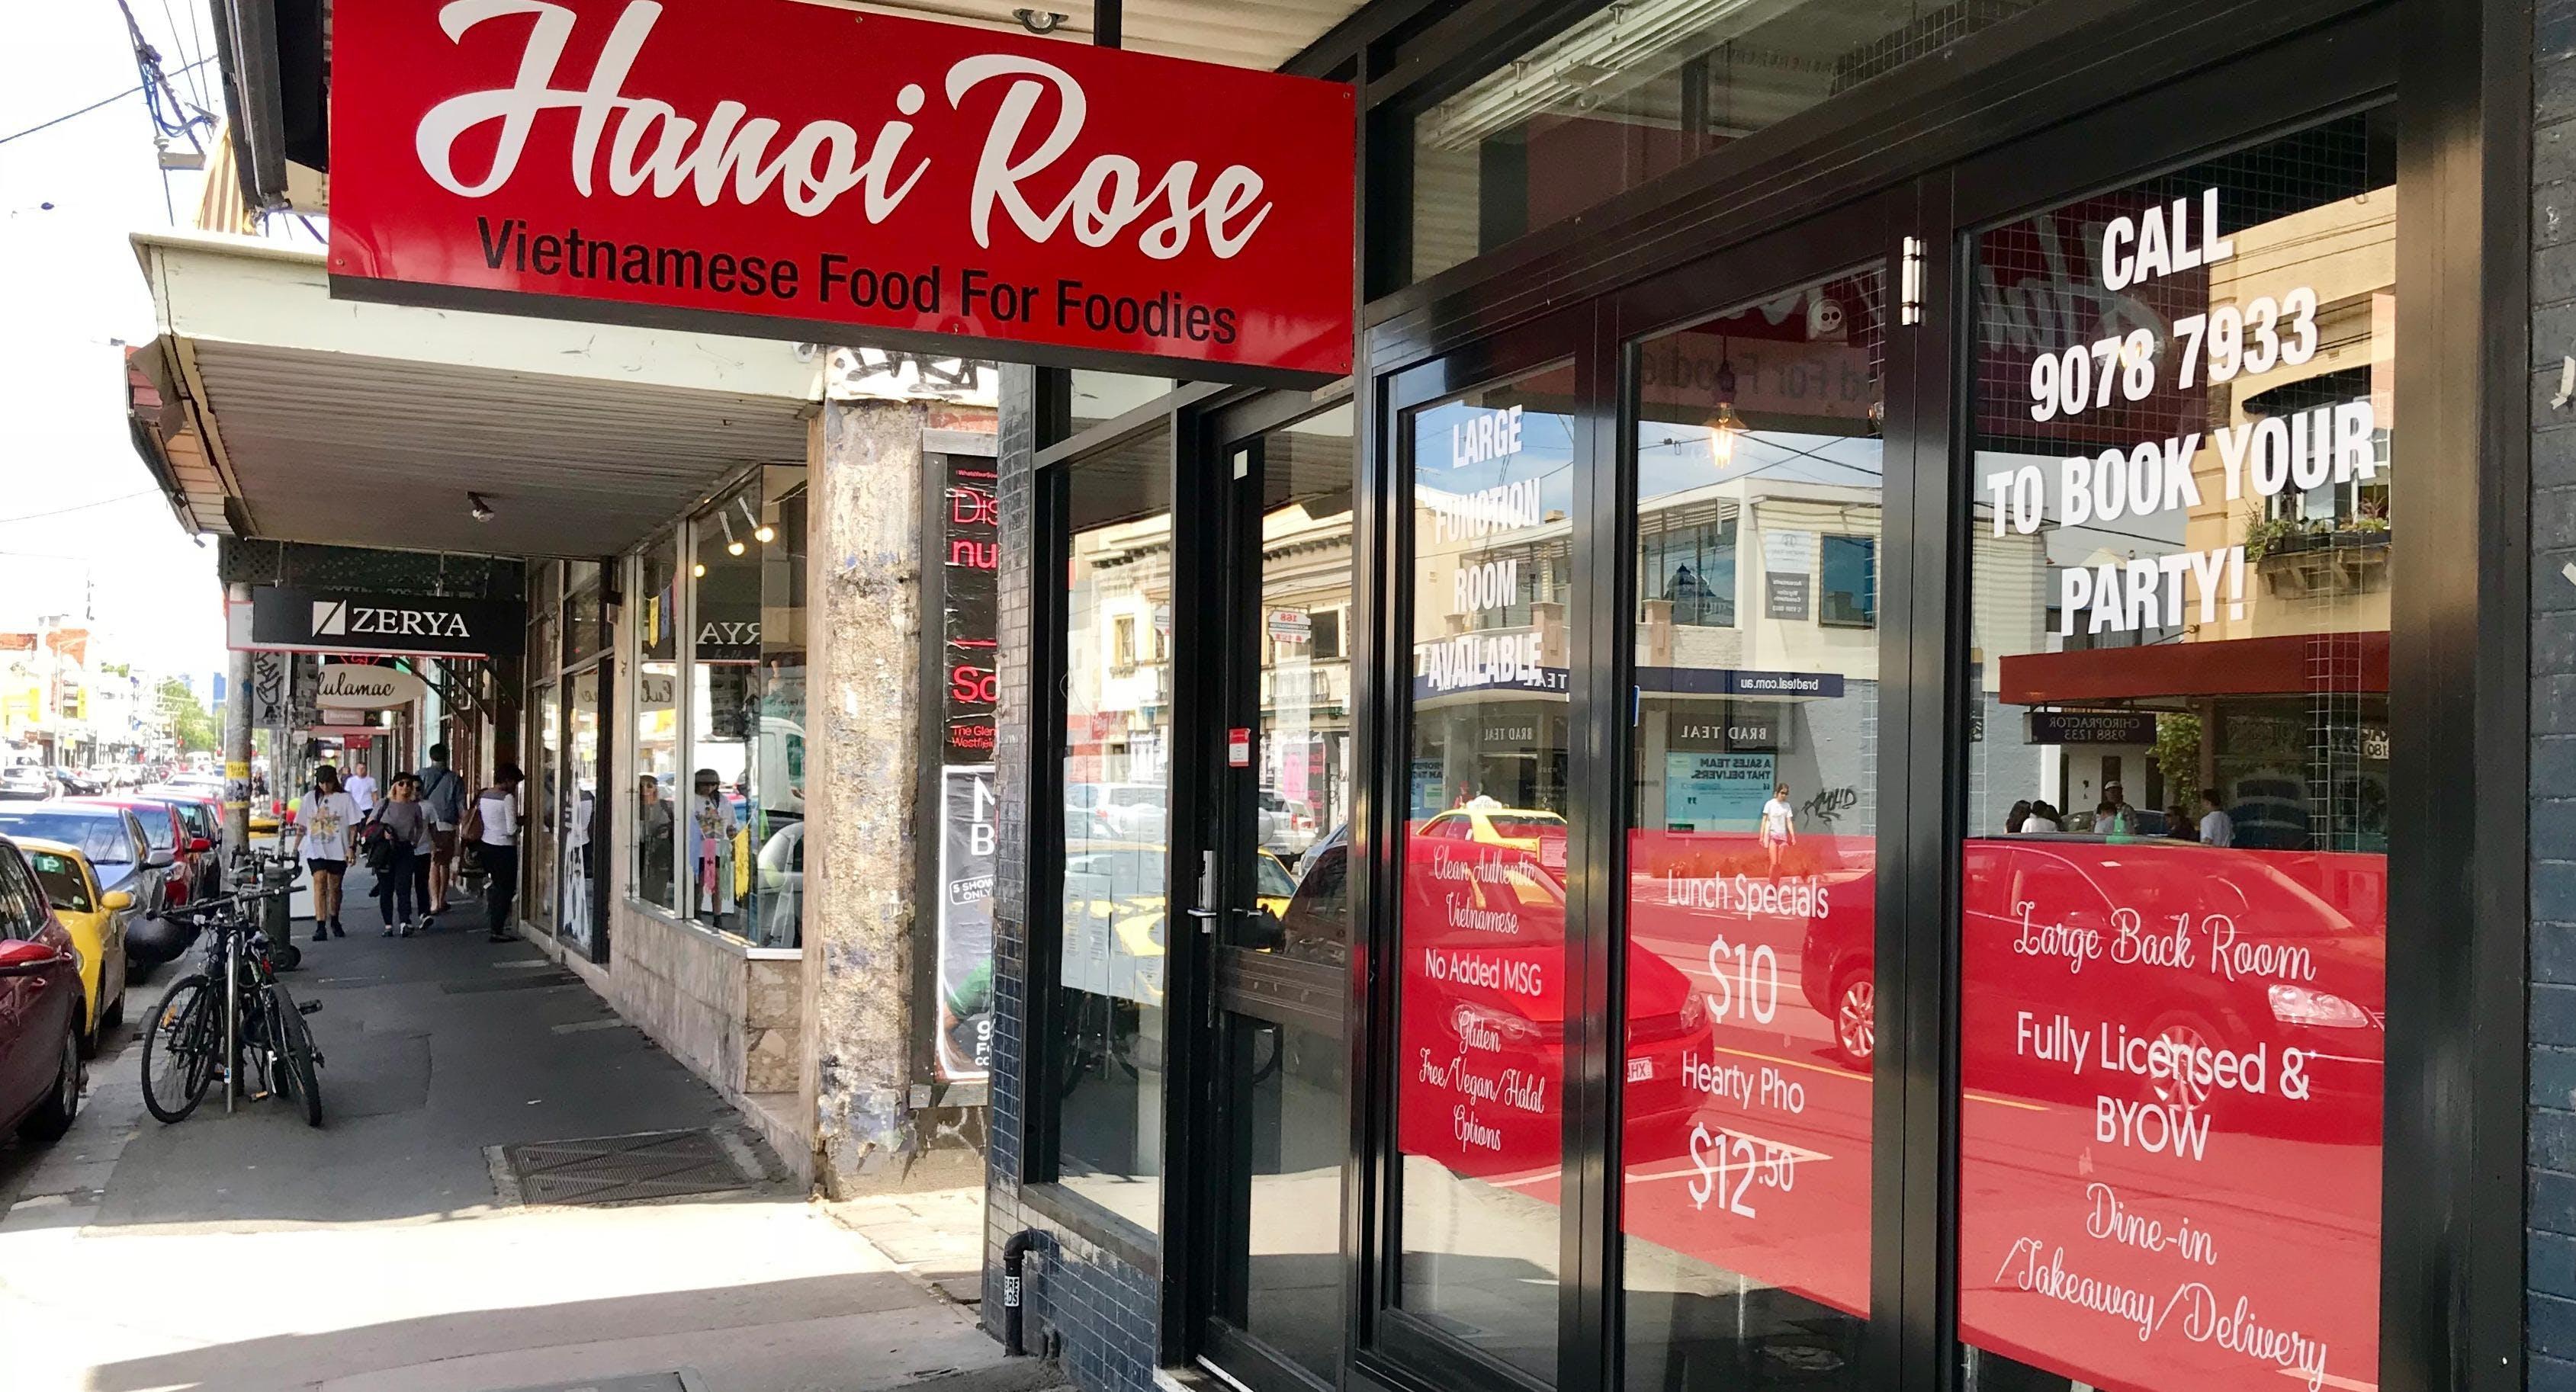 Hanoi Rose